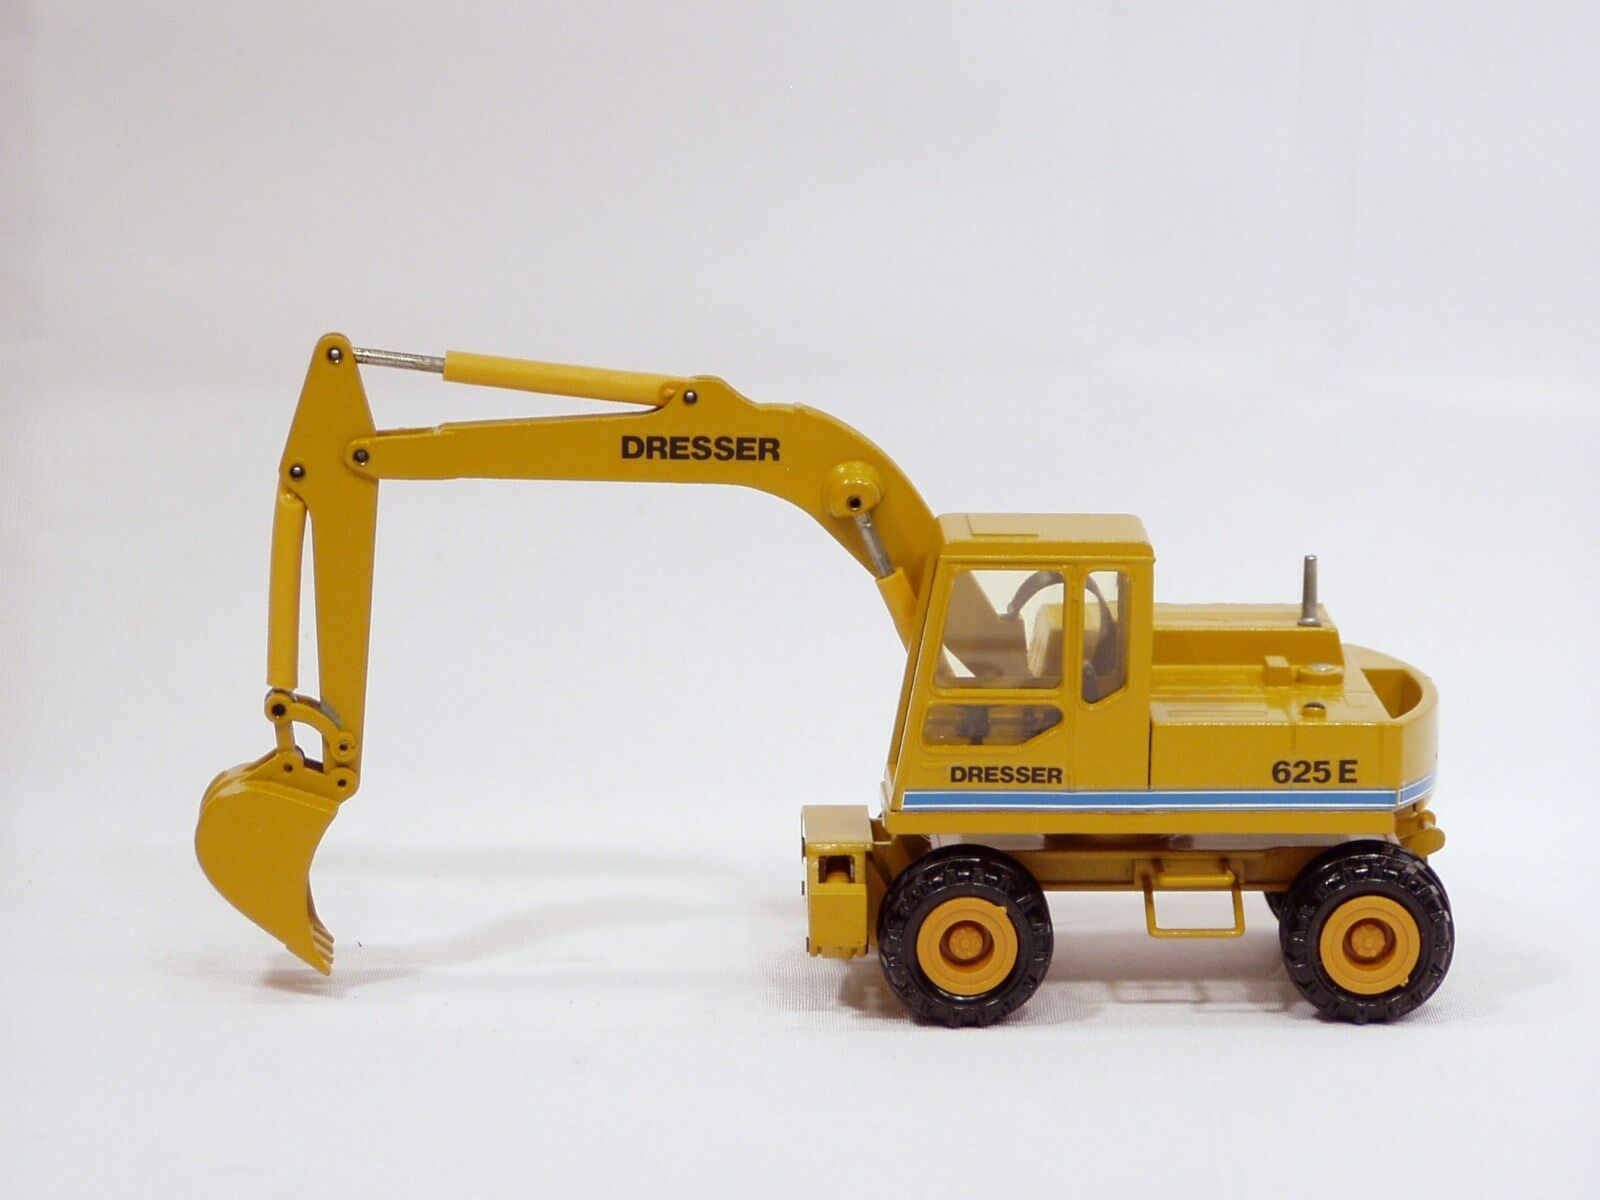 Dresser 625E Wheel Excavator - 1 50 - Conrad No Box